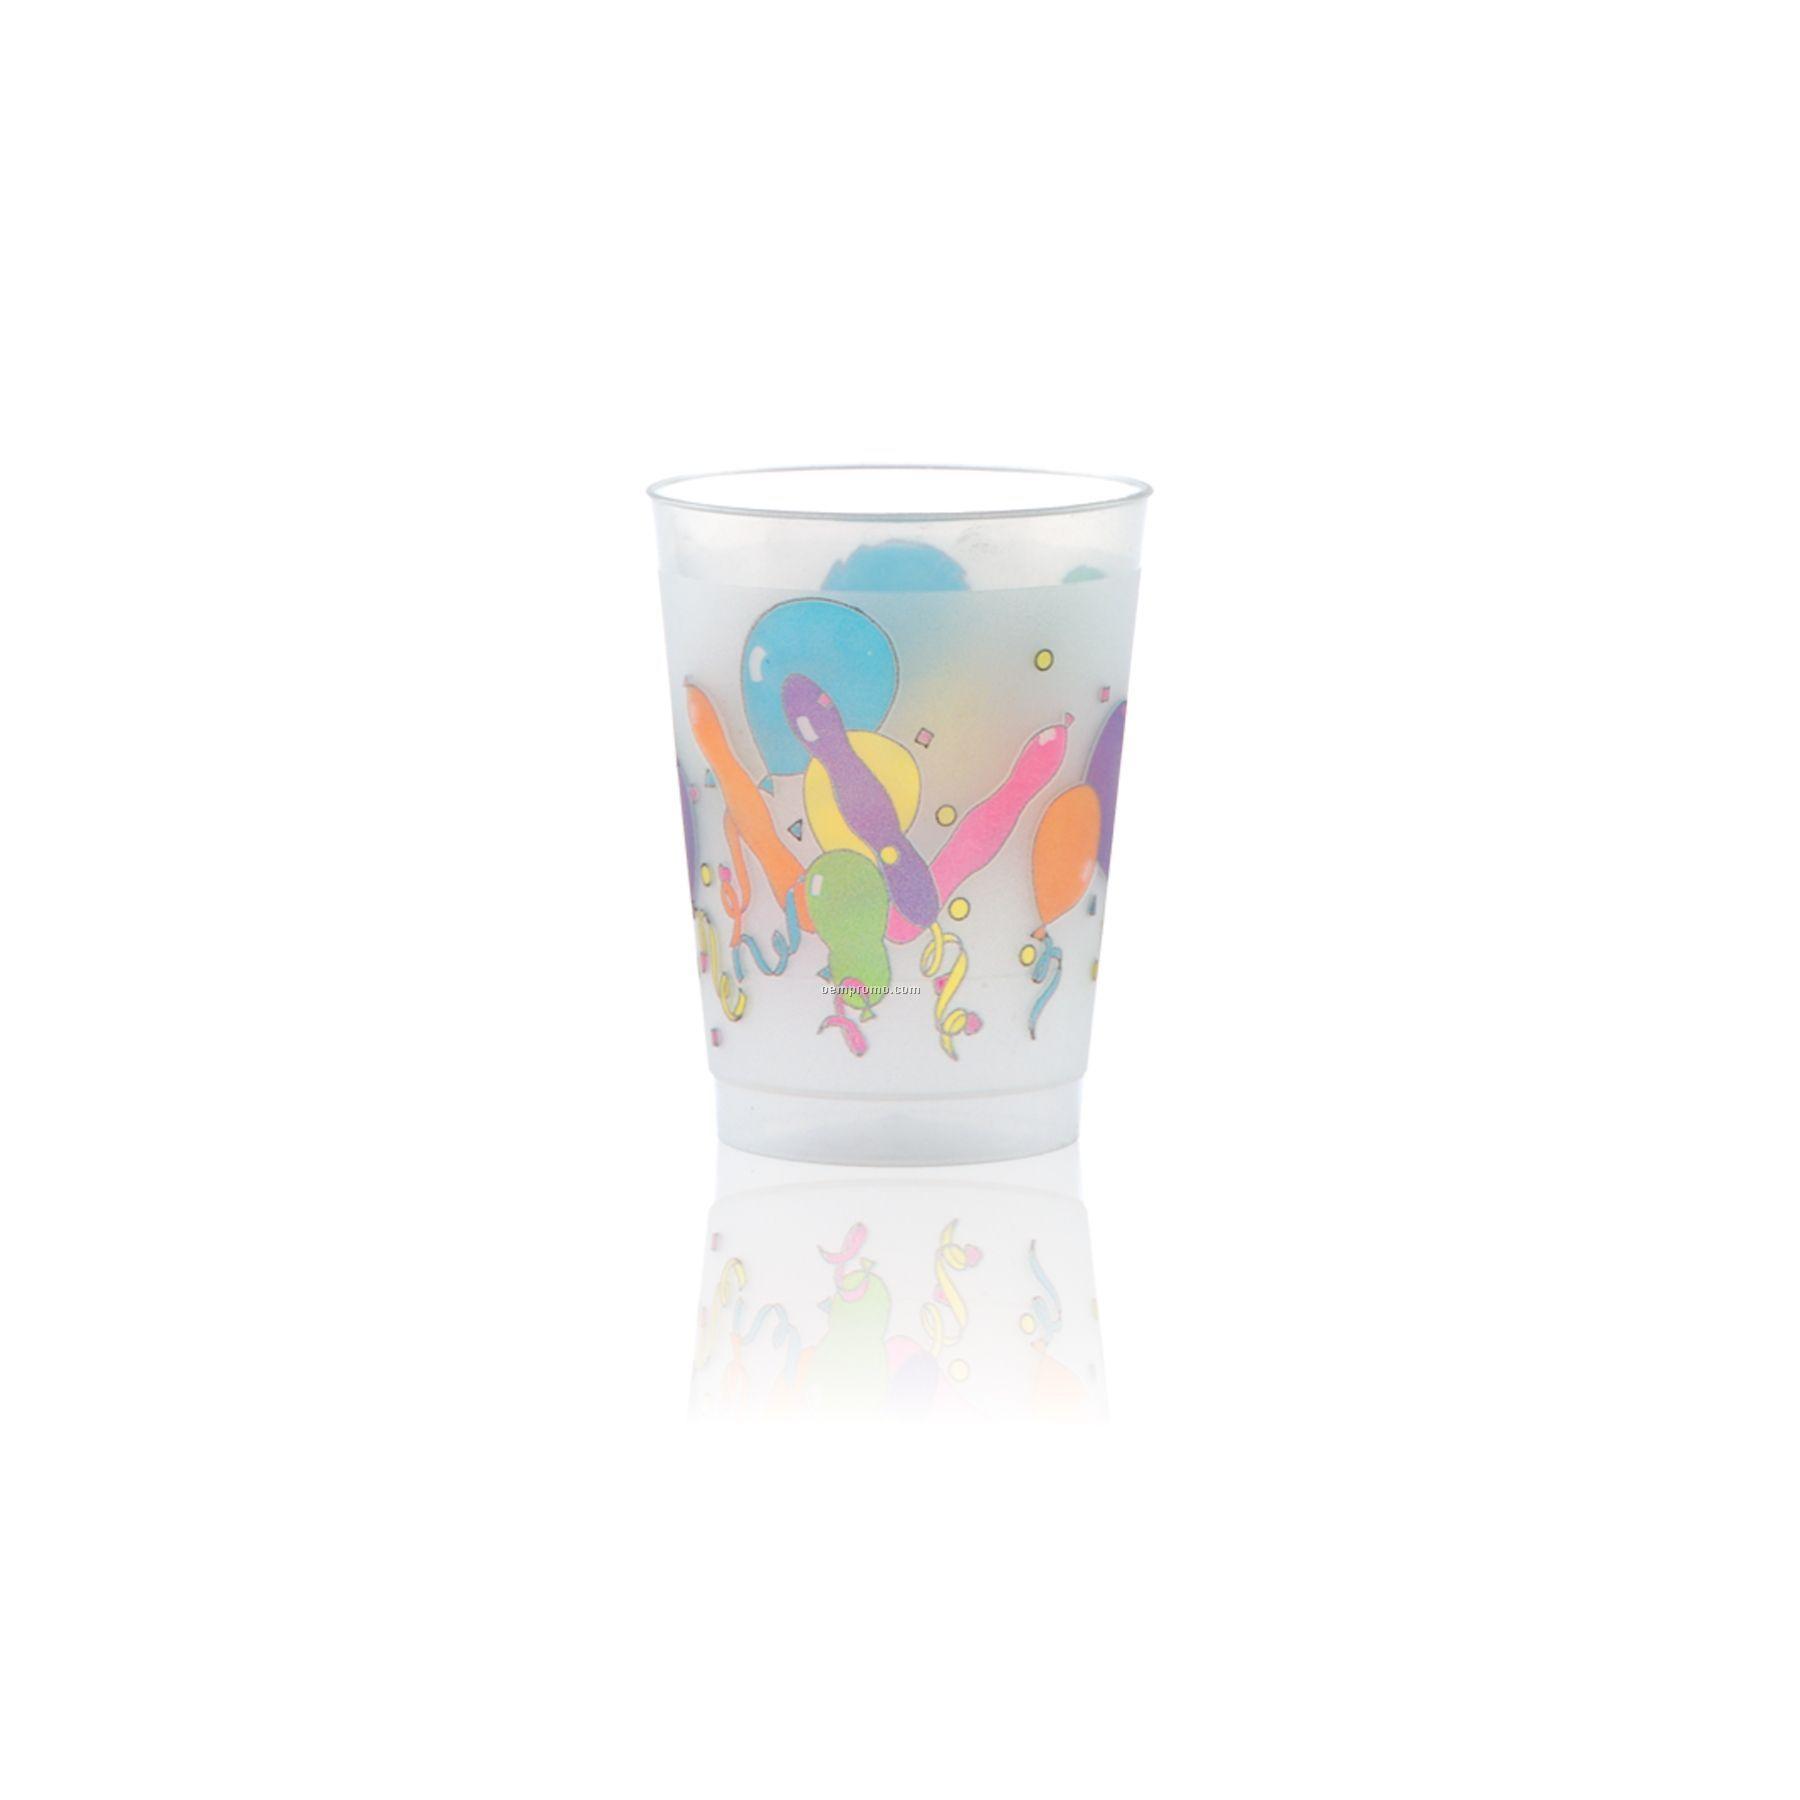 10 Oz. Frost-flex Cup